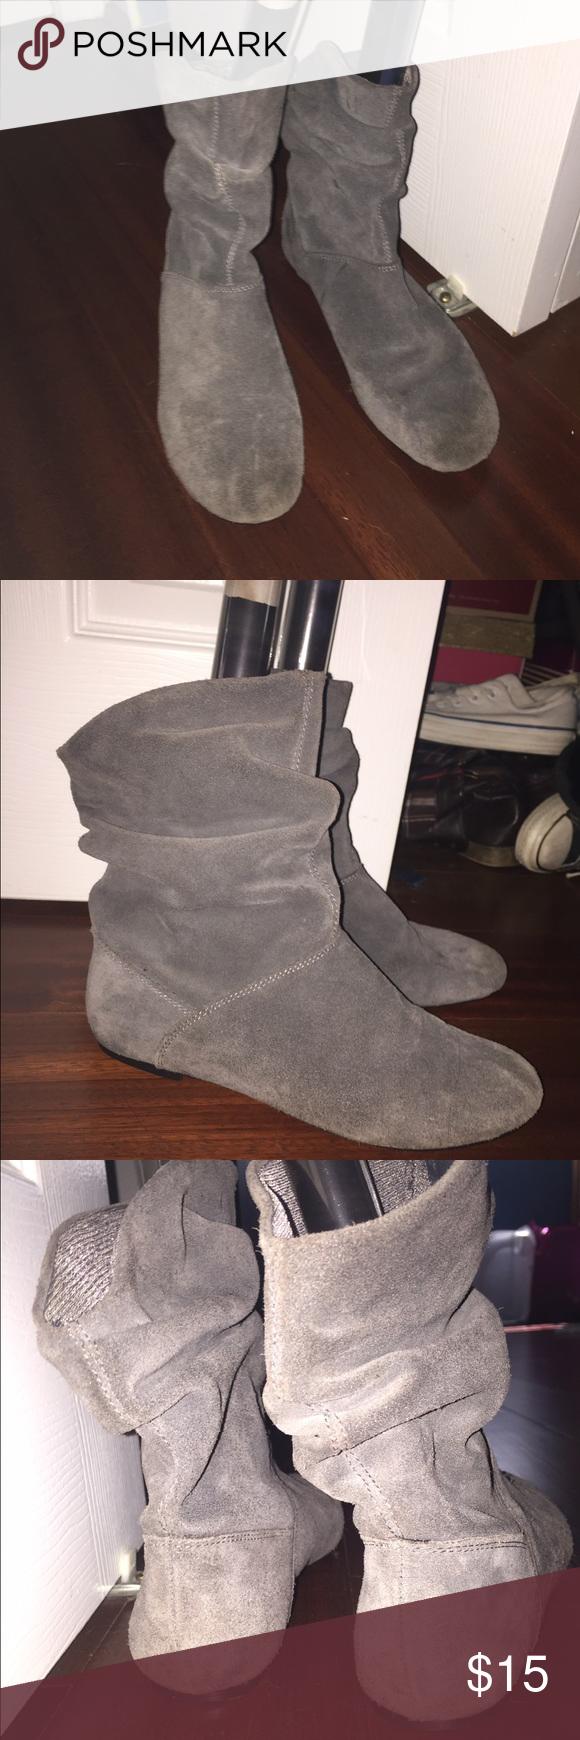 Flat booties Suede, grey booties. No heel. Slightly worn but still good. Macy's Shoes Ankle Boots & Booties